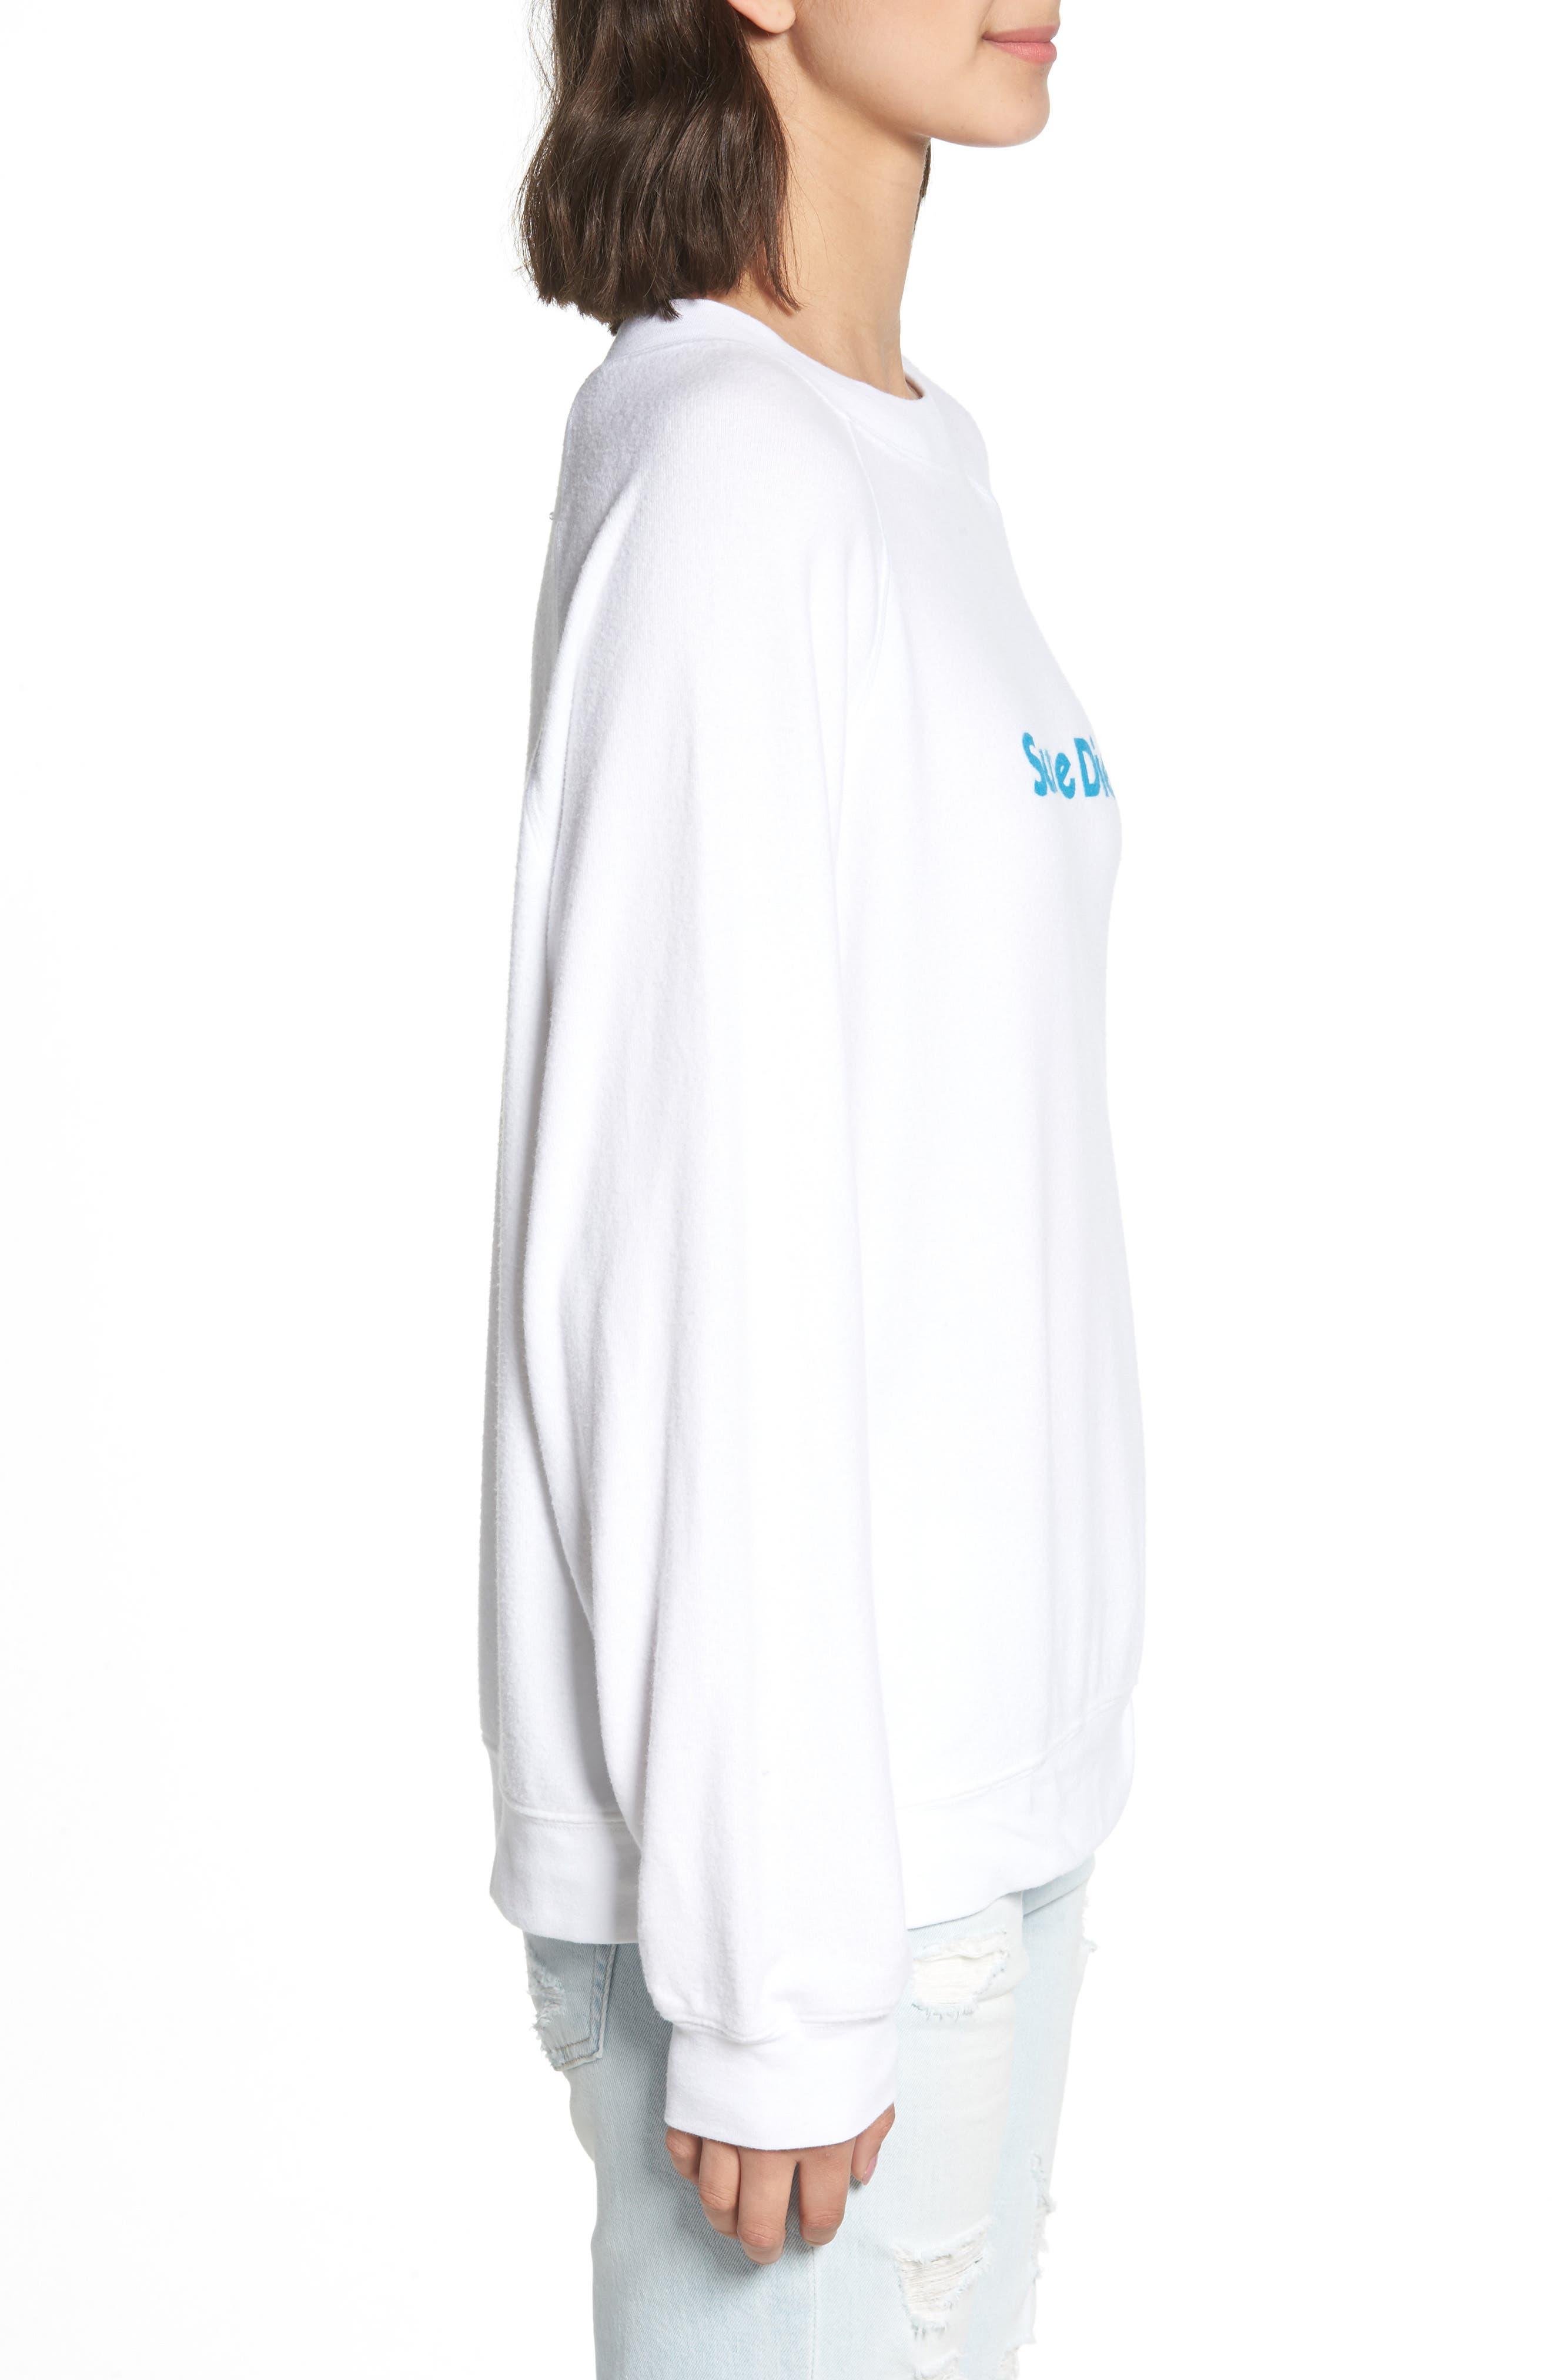 Sunshine Diet Sommers Sweatshirt,                             Alternate thumbnail 3, color,                             CLEAN WHITE